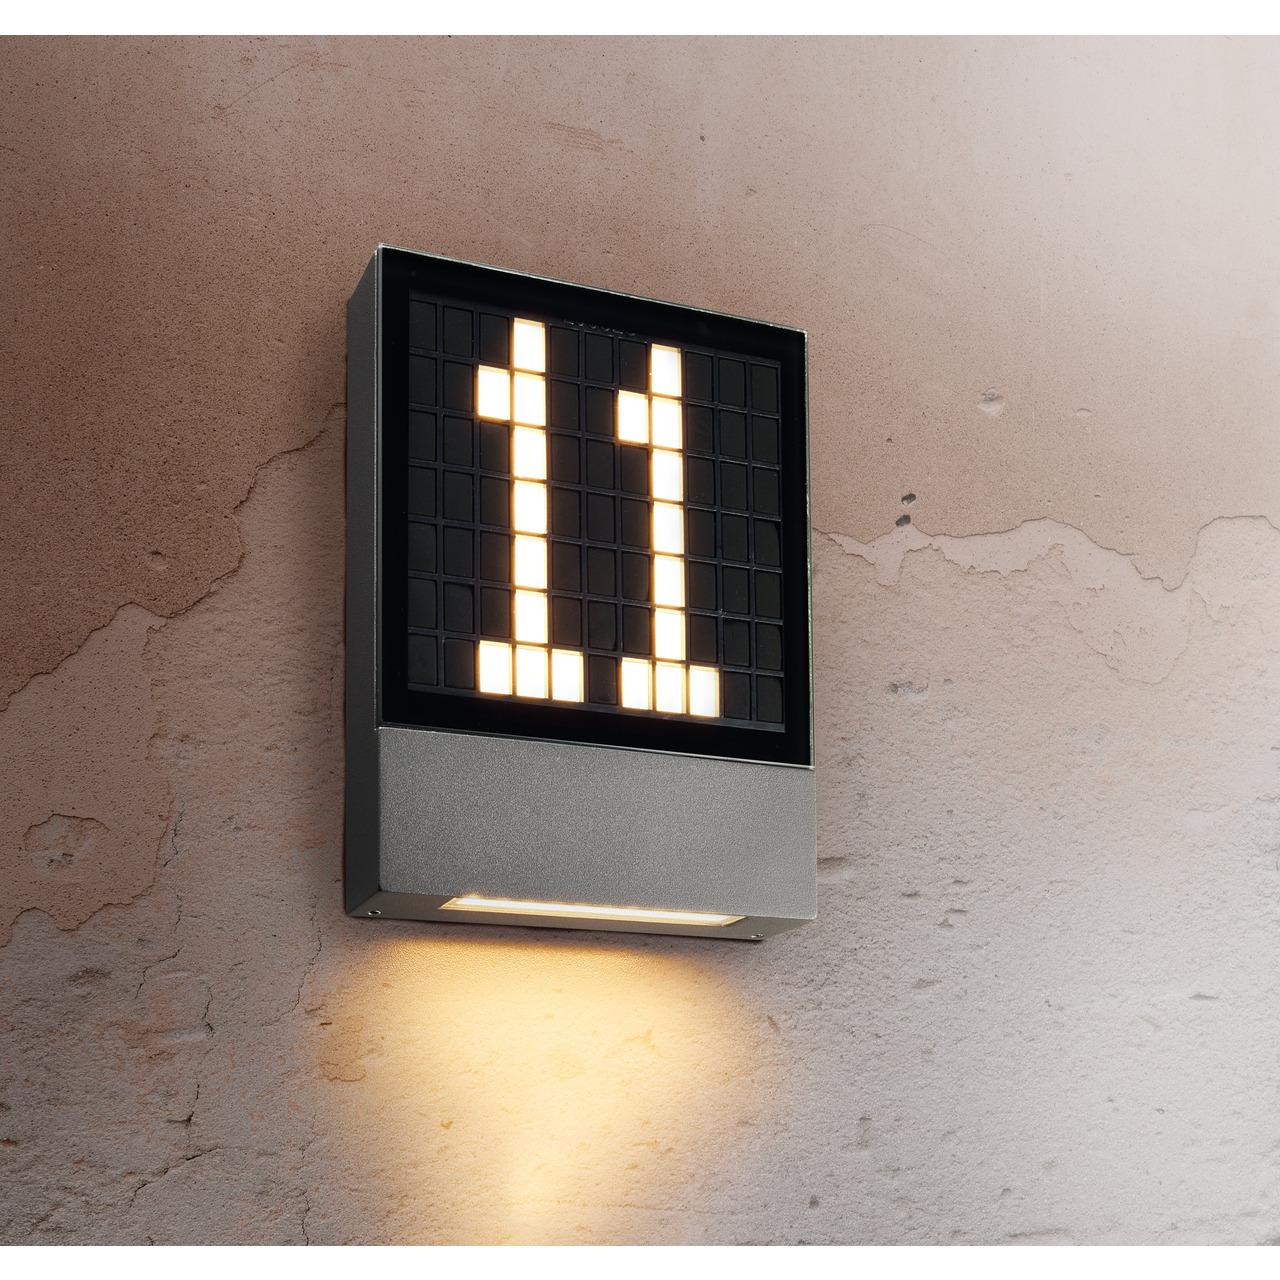 HEITRONIC 4-5-W-LED-Hausnummernleuchte Pavia- Ziffern steckbar- Aluminium-Gehäuse- 230 V AC- IP54